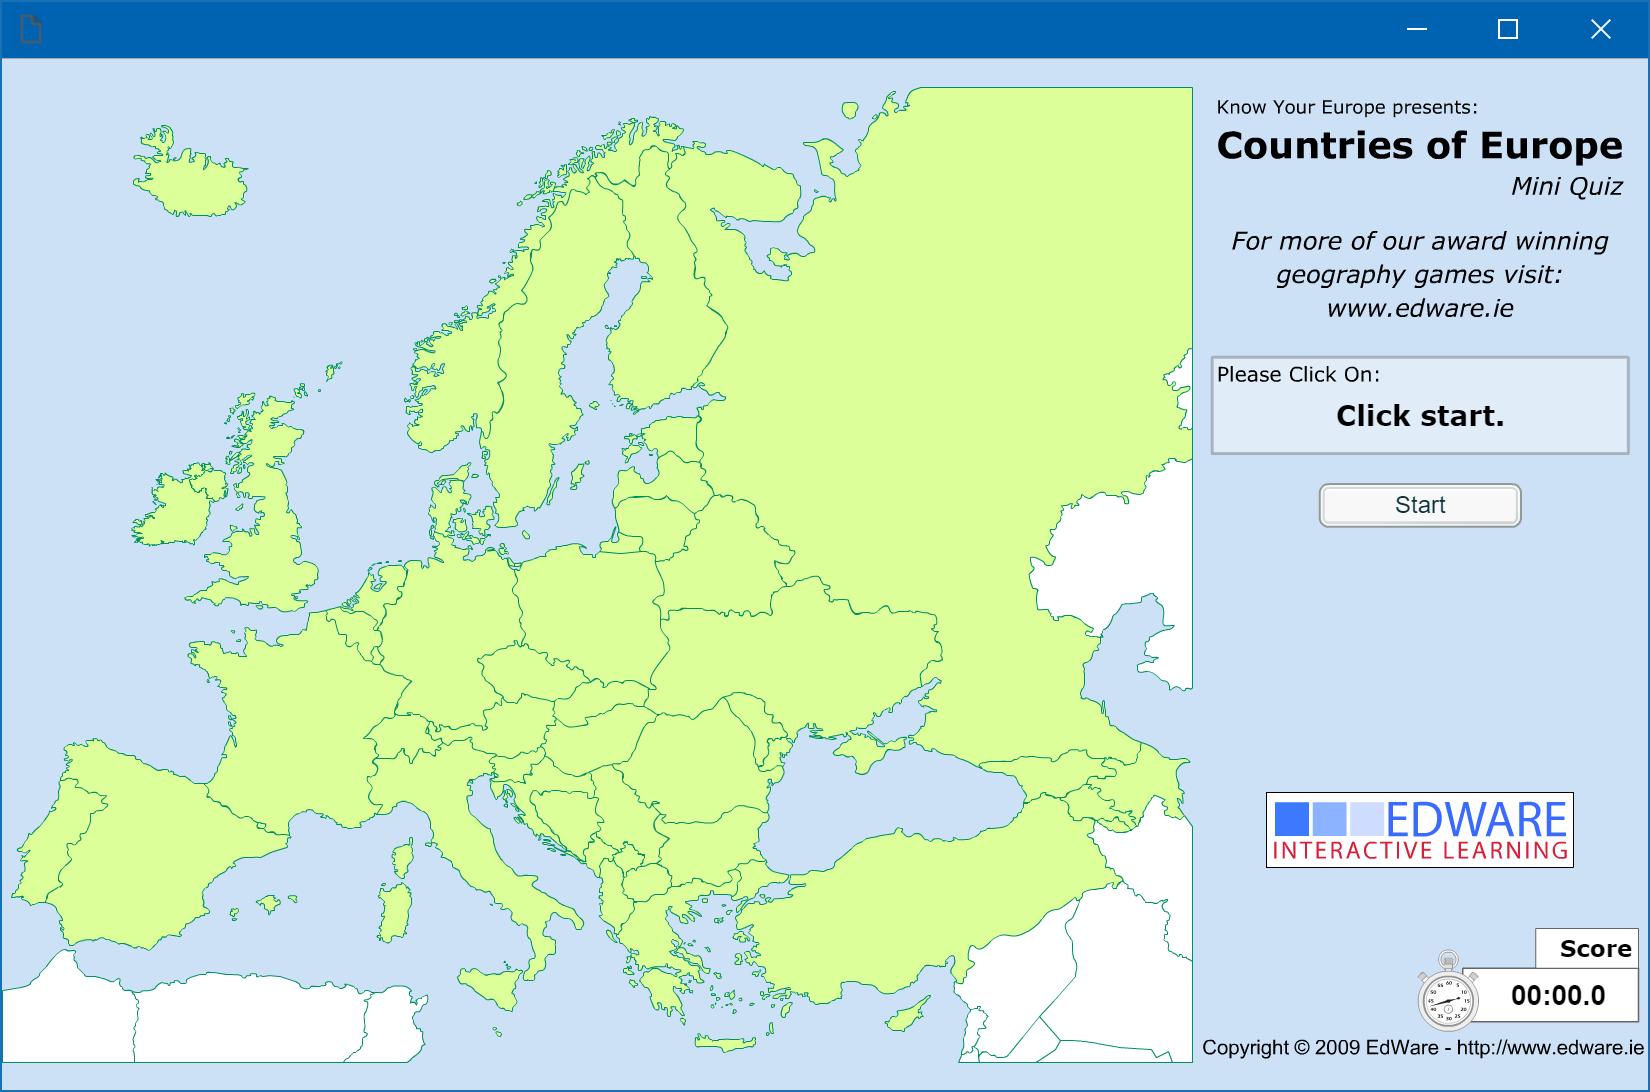 Countries of Europe: Mini Quiz